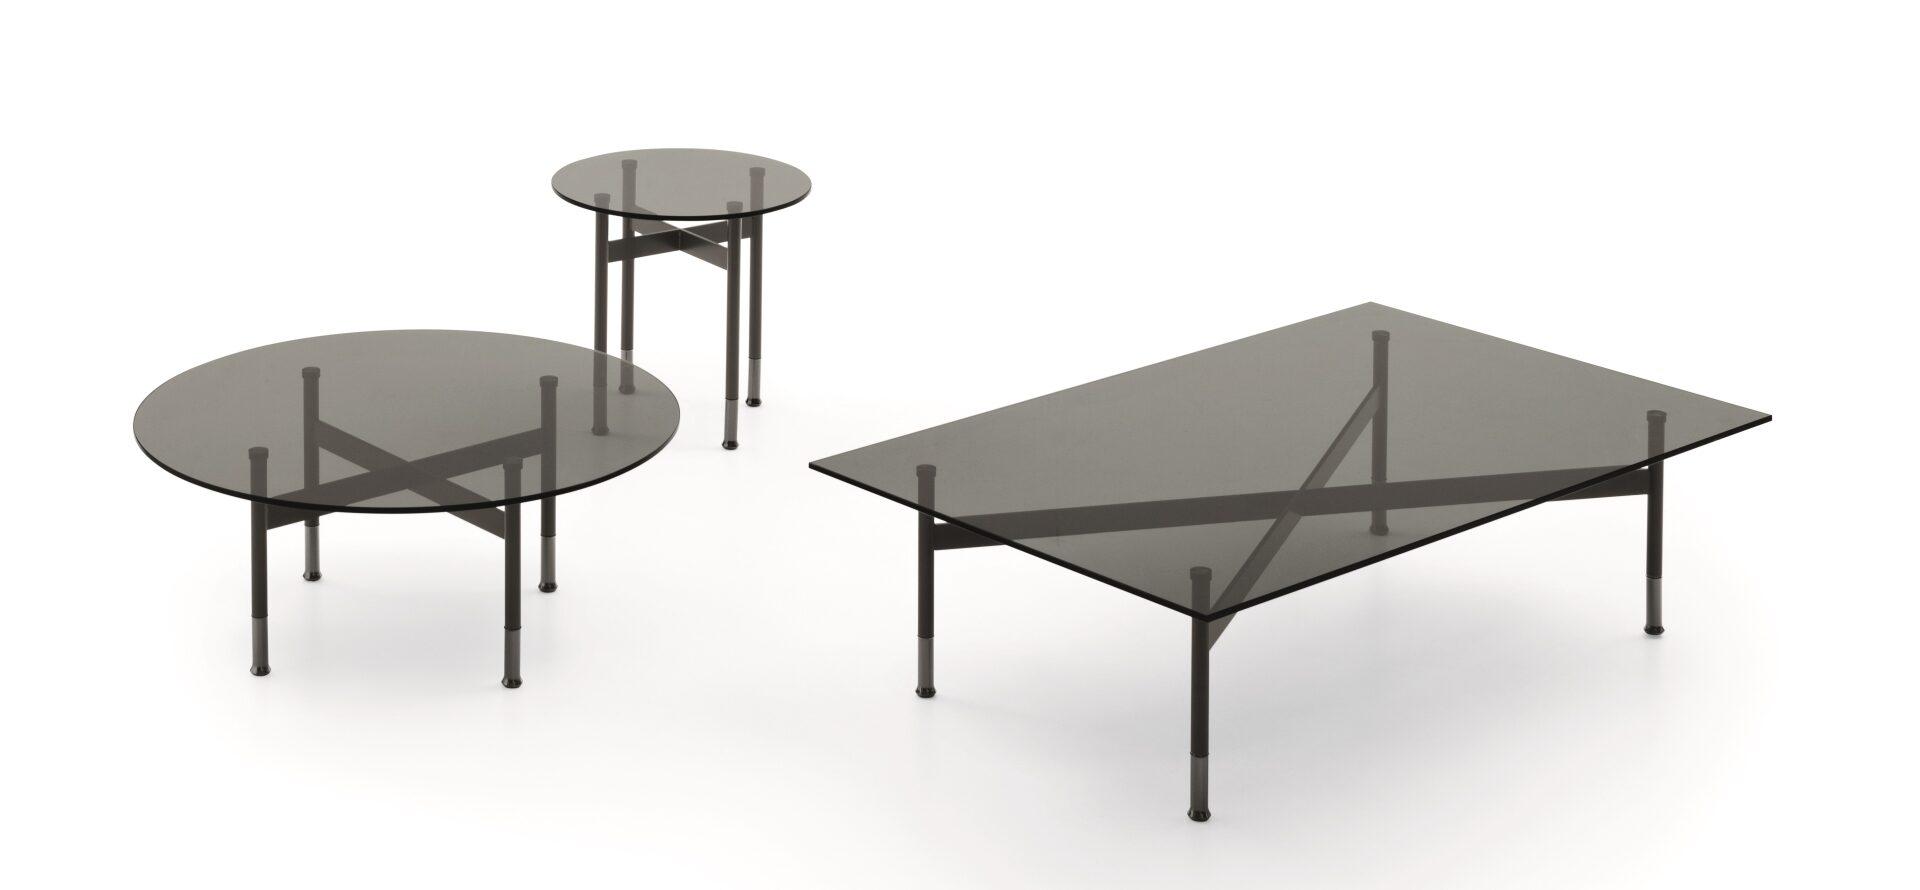 DiningLiving-Furniture-2021_Dialogo_-02-1920×890-c-default